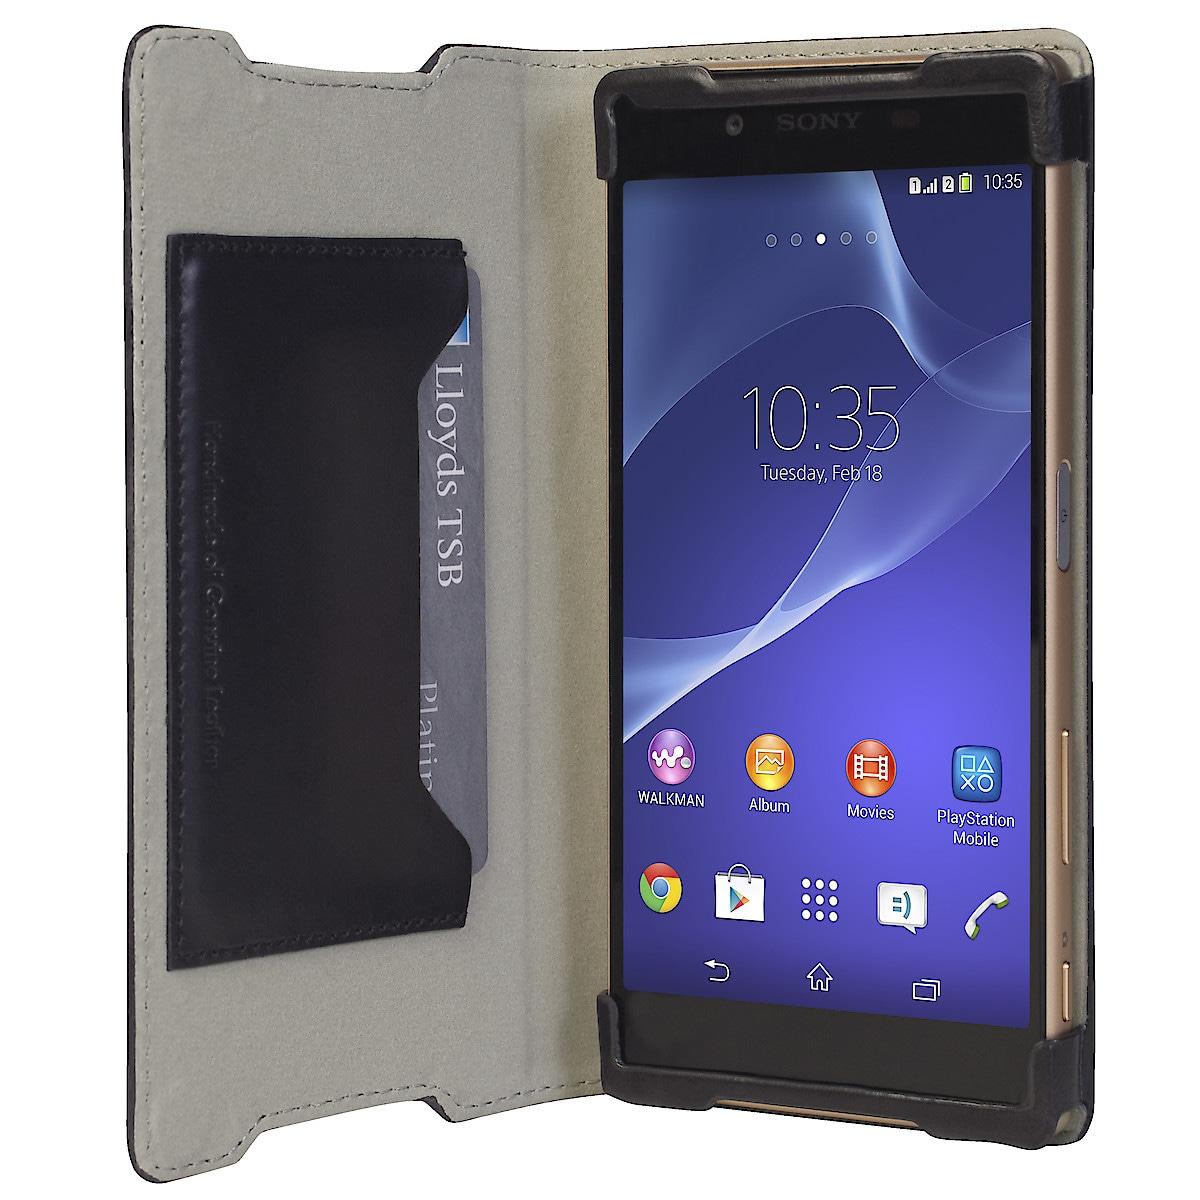 Krusell Kiruna FlipCover Case for Sony Xperia Z5